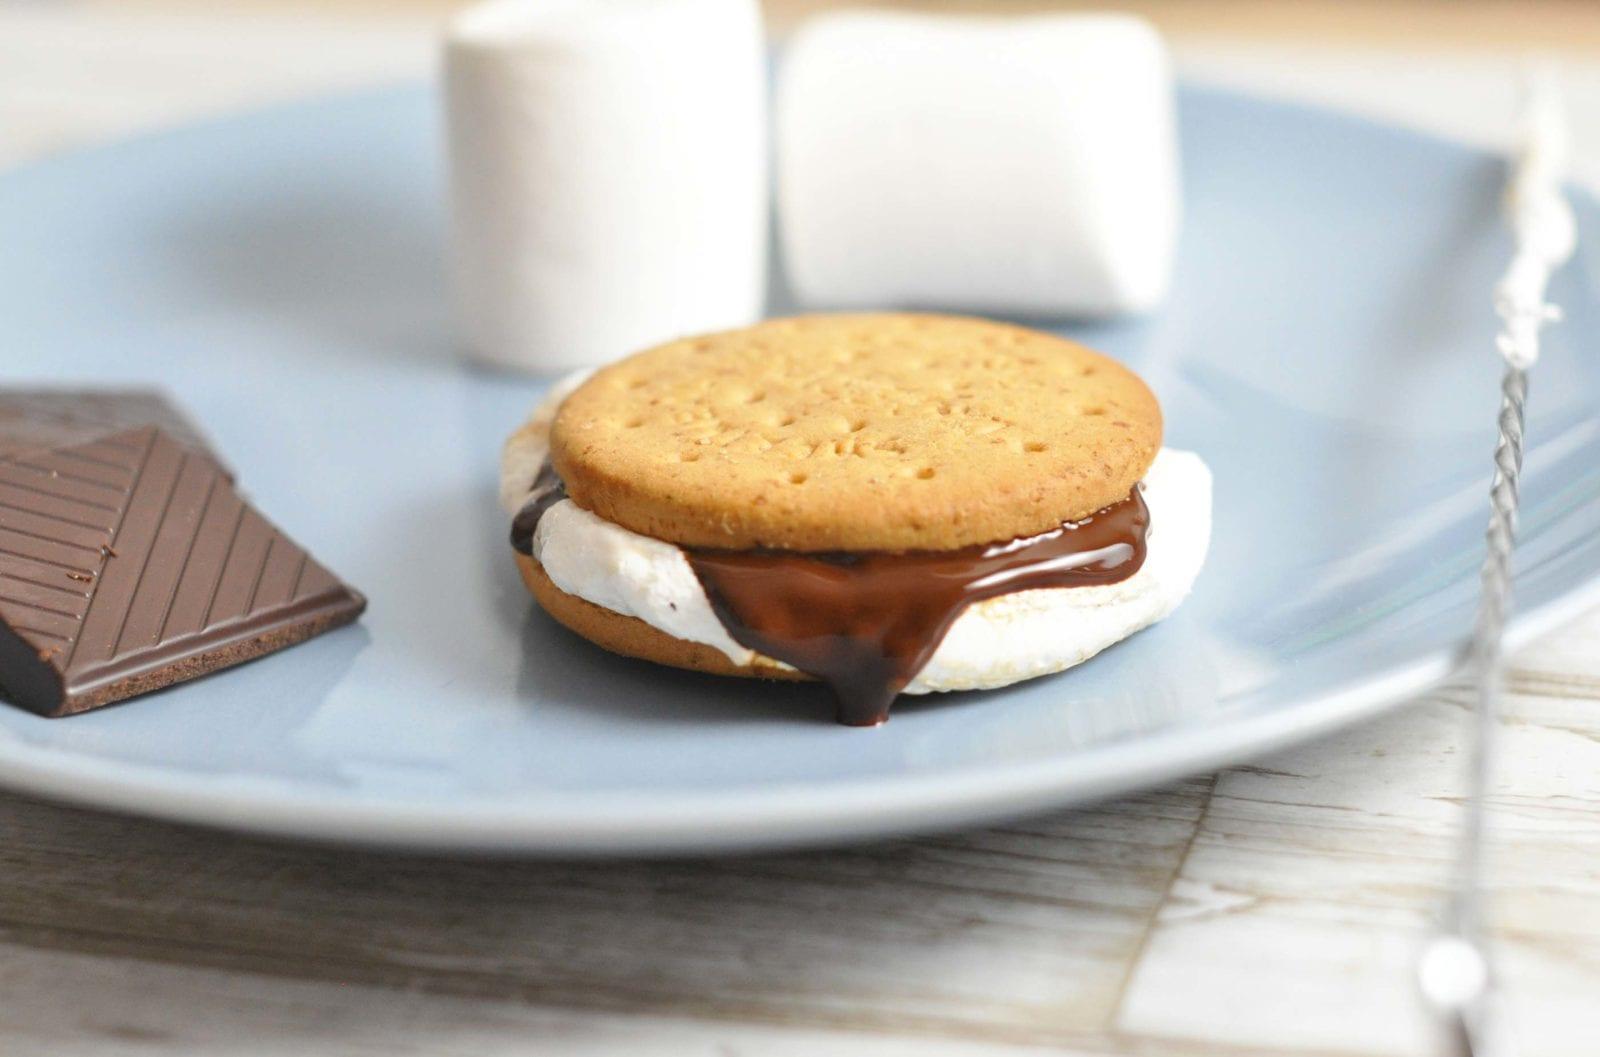 S'mores - grillede skumfiduser med kiks og chokolade